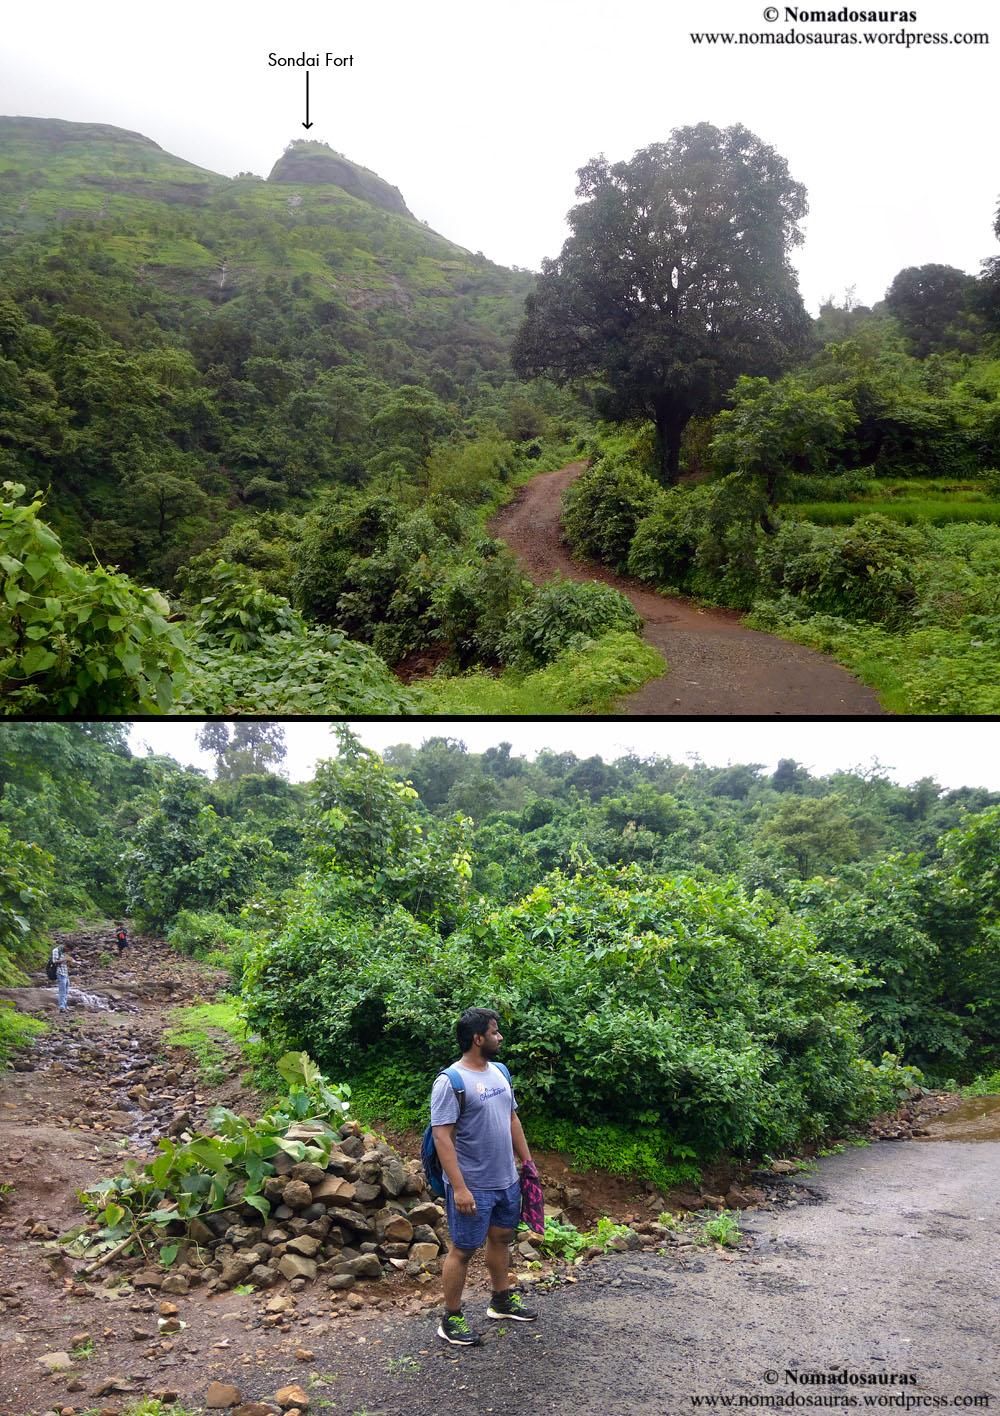 photo of sondai fort trek route